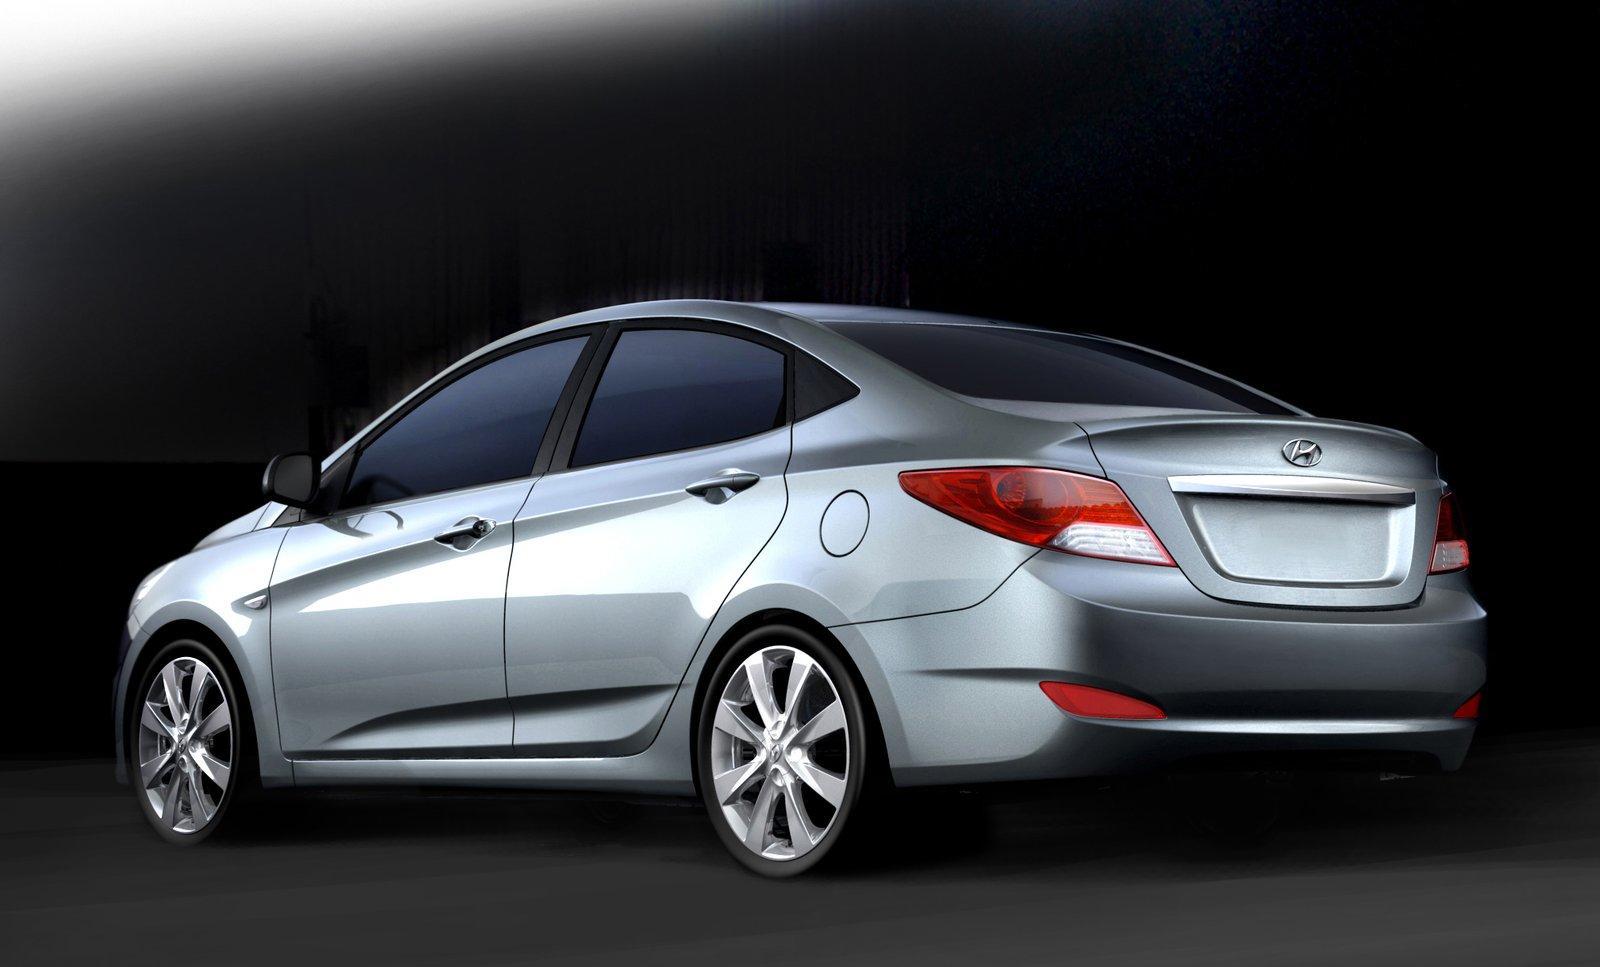 Hyundai Verna Fluidic RB 2011 Price In India Review